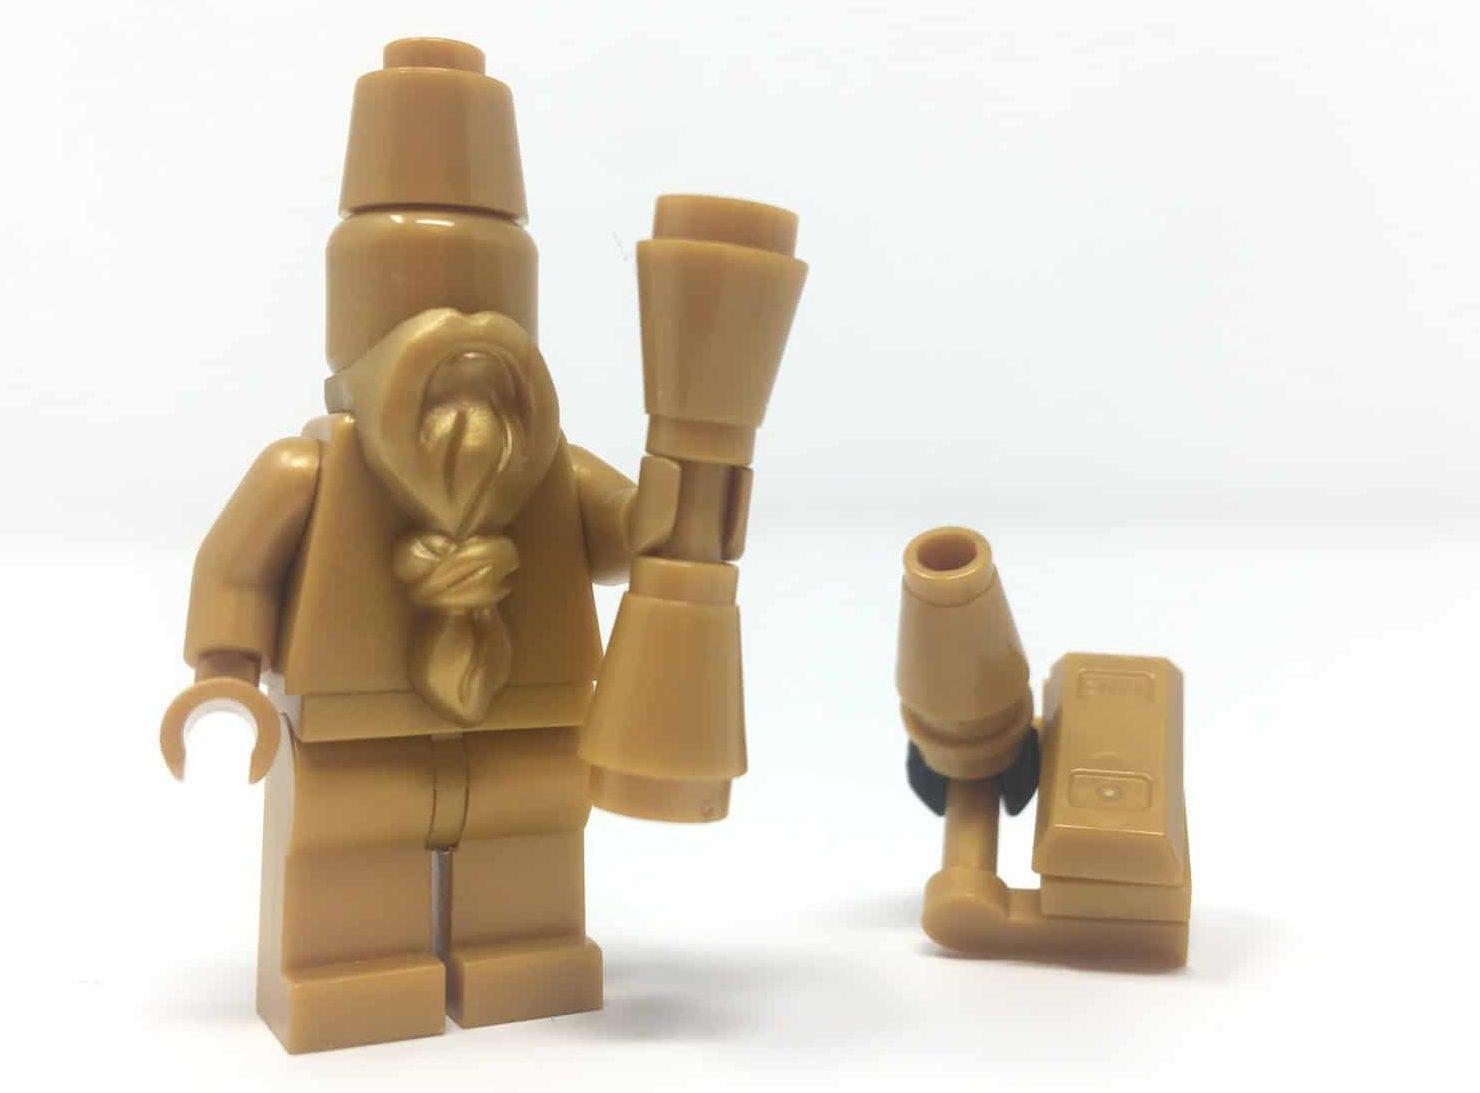 LEGO 75964 Harry Potter Adventskalender 2019 Tür 21